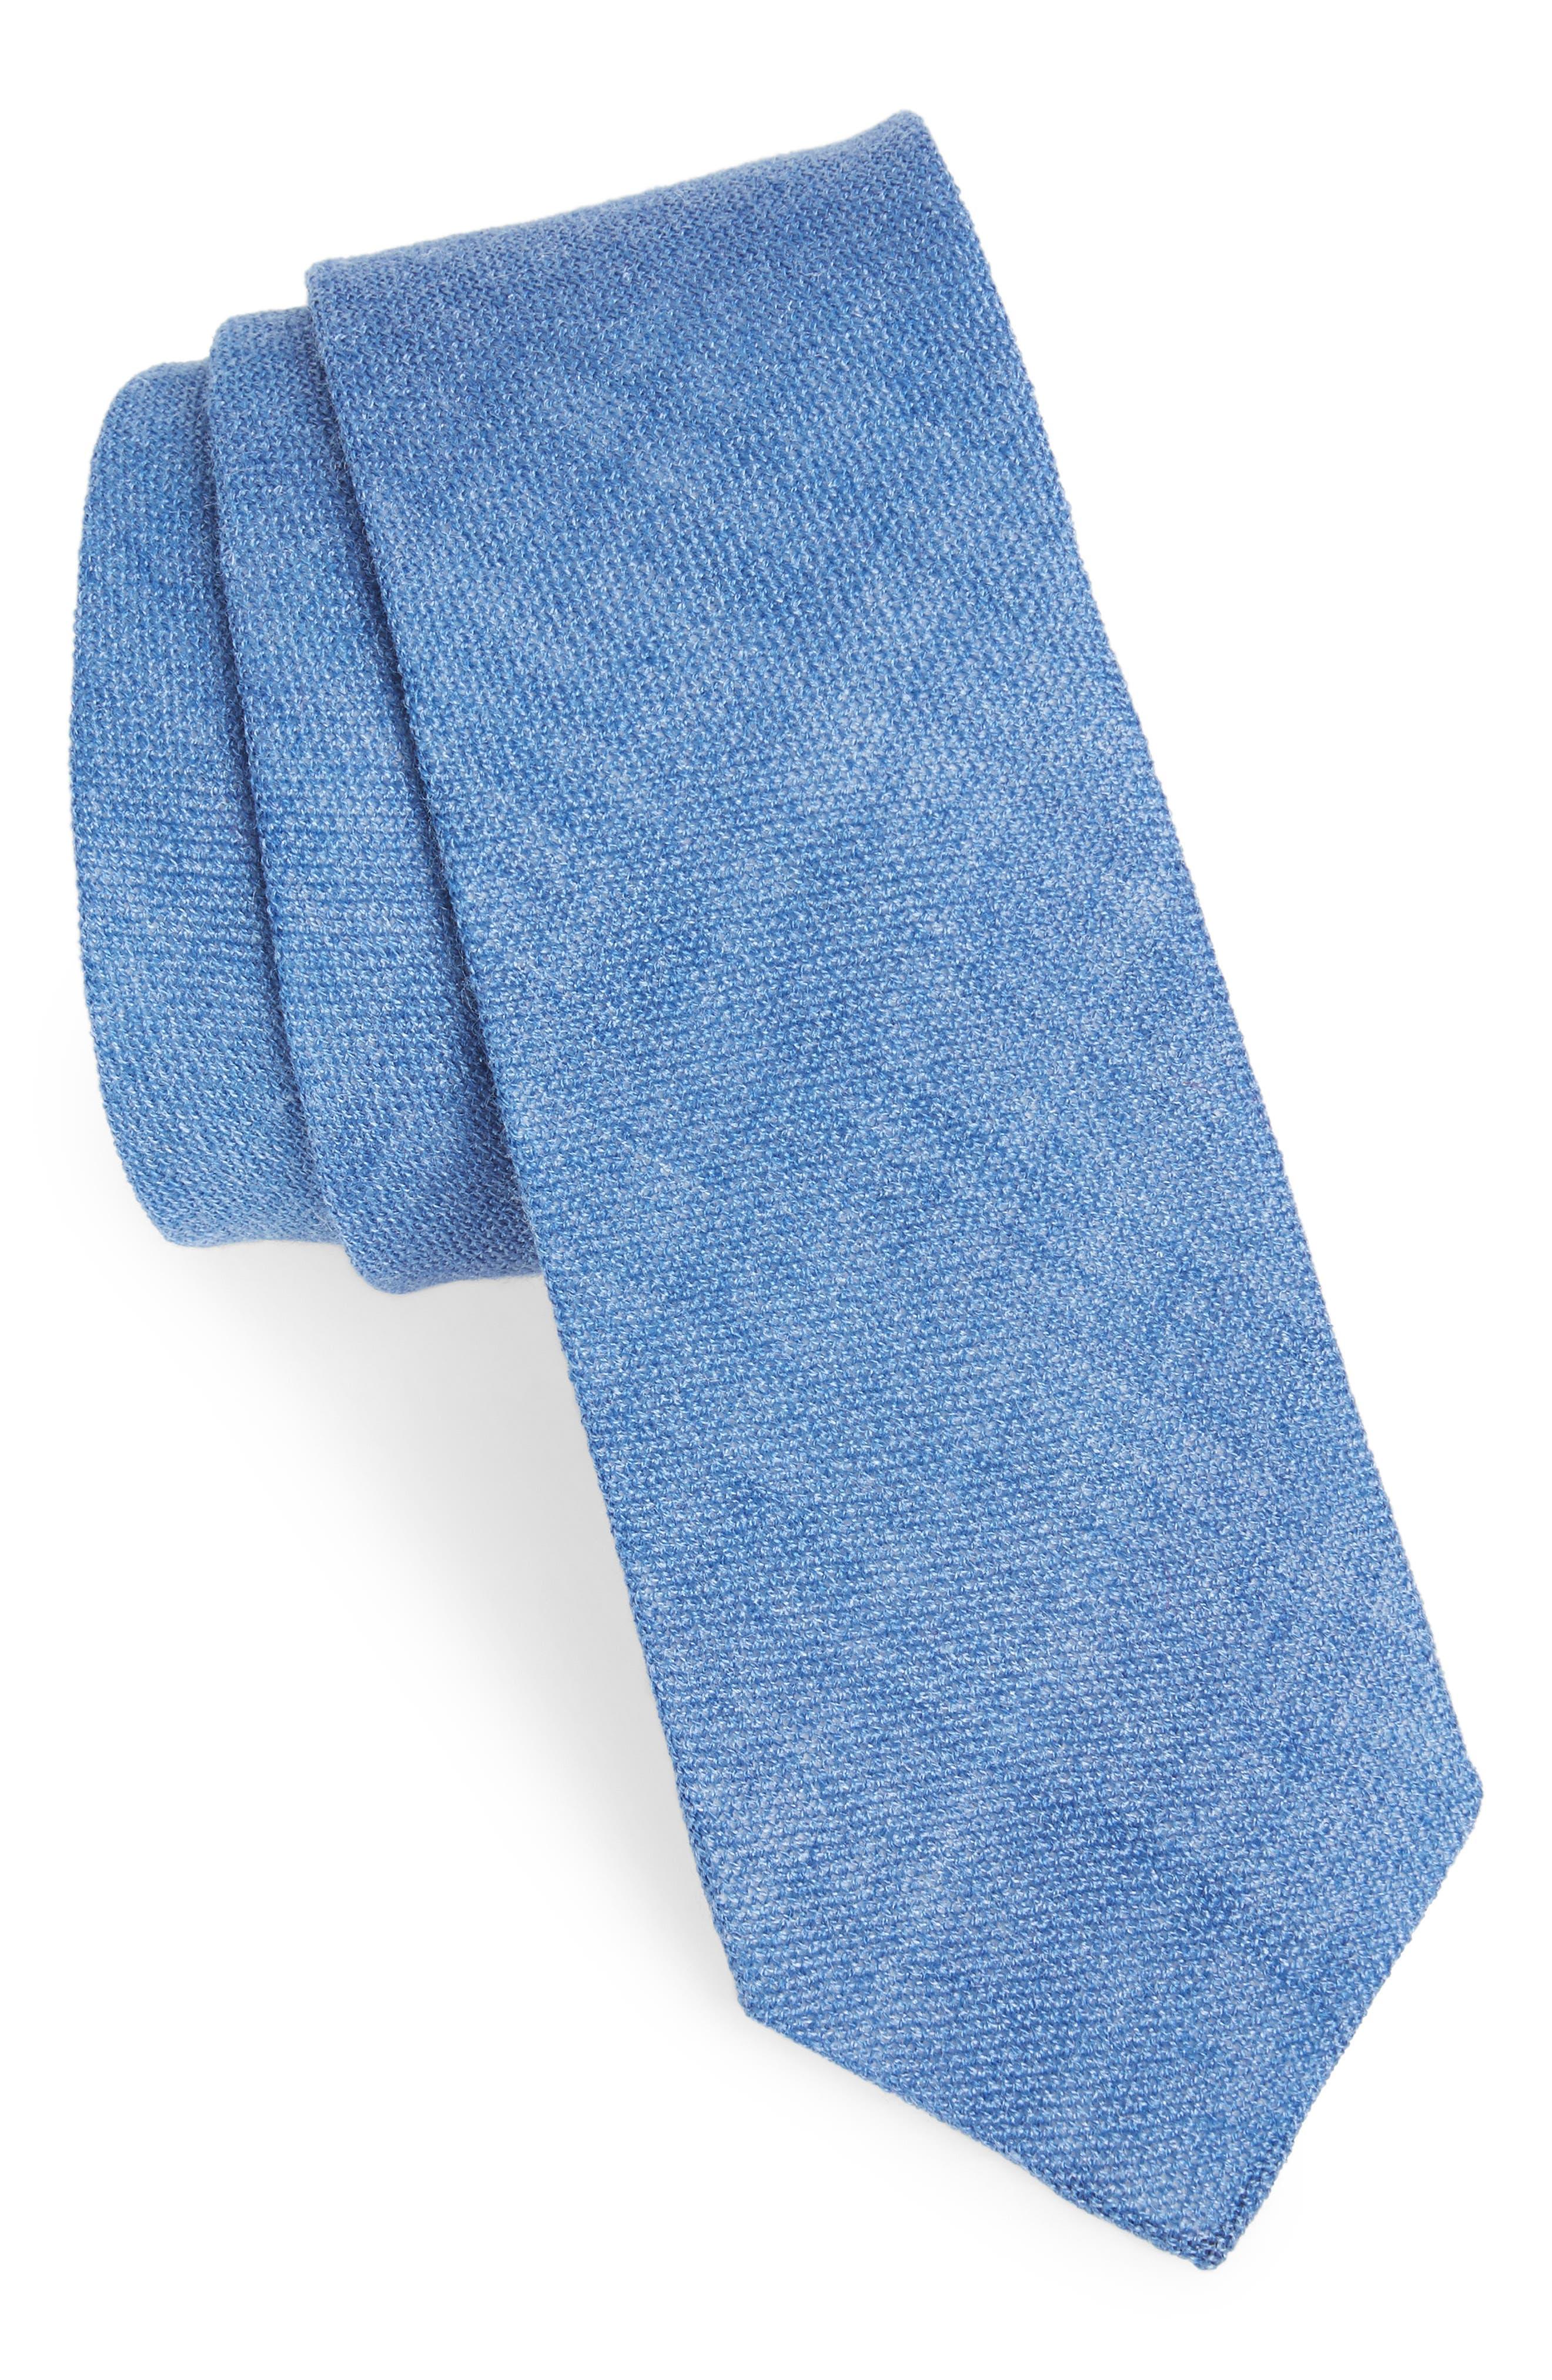 Bradford Solid Cotton Skinny Tie,                             Main thumbnail 1, color,                             400